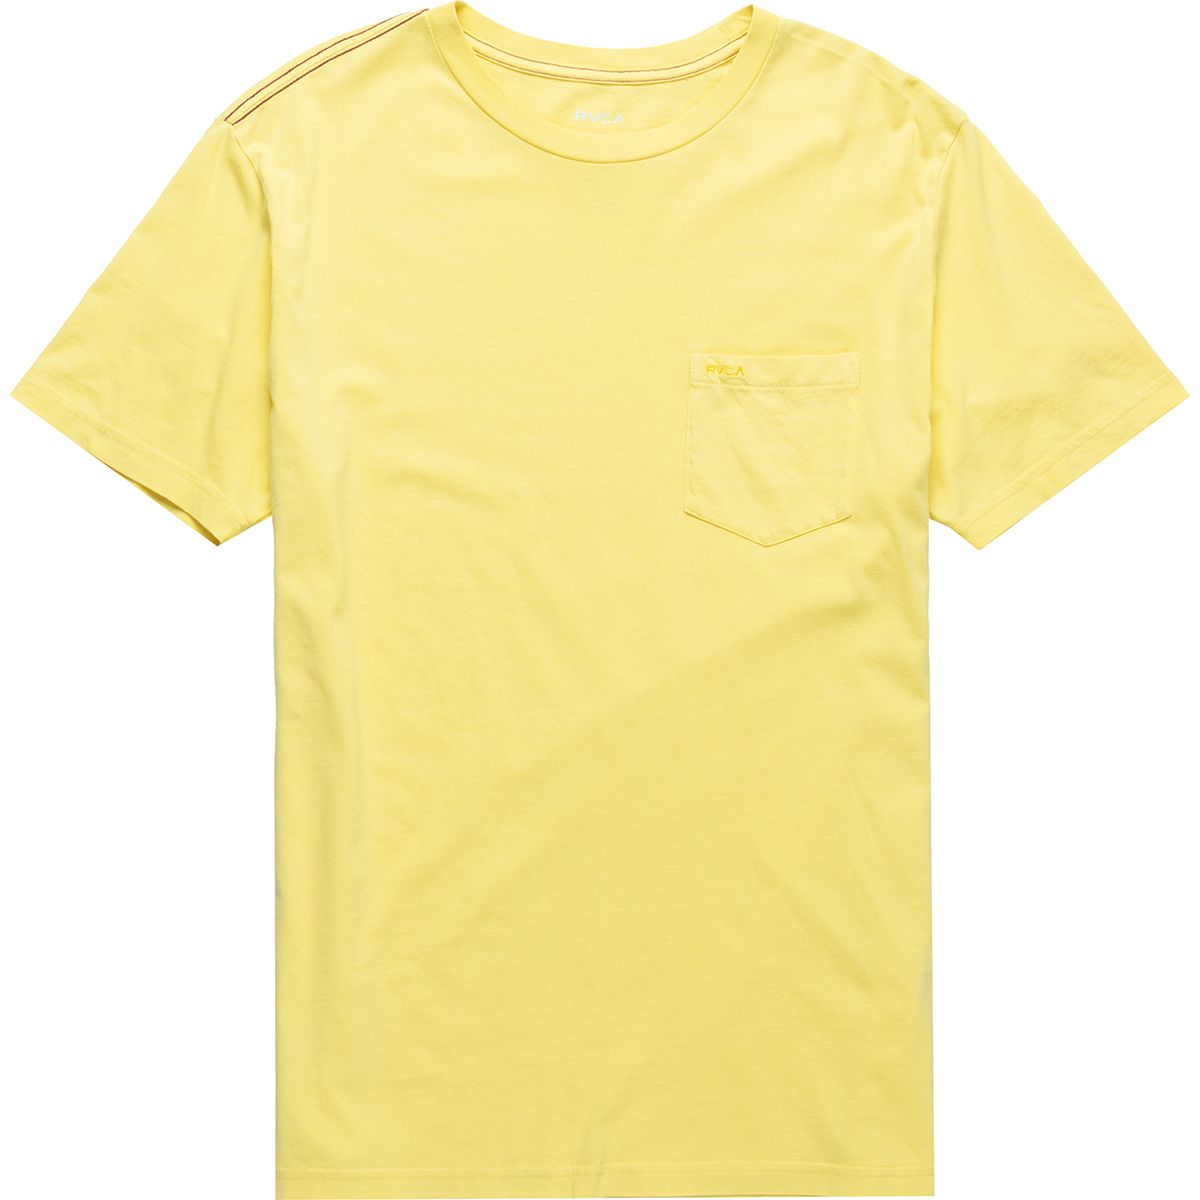 PTC 2 Pigment T-Shirt - Men